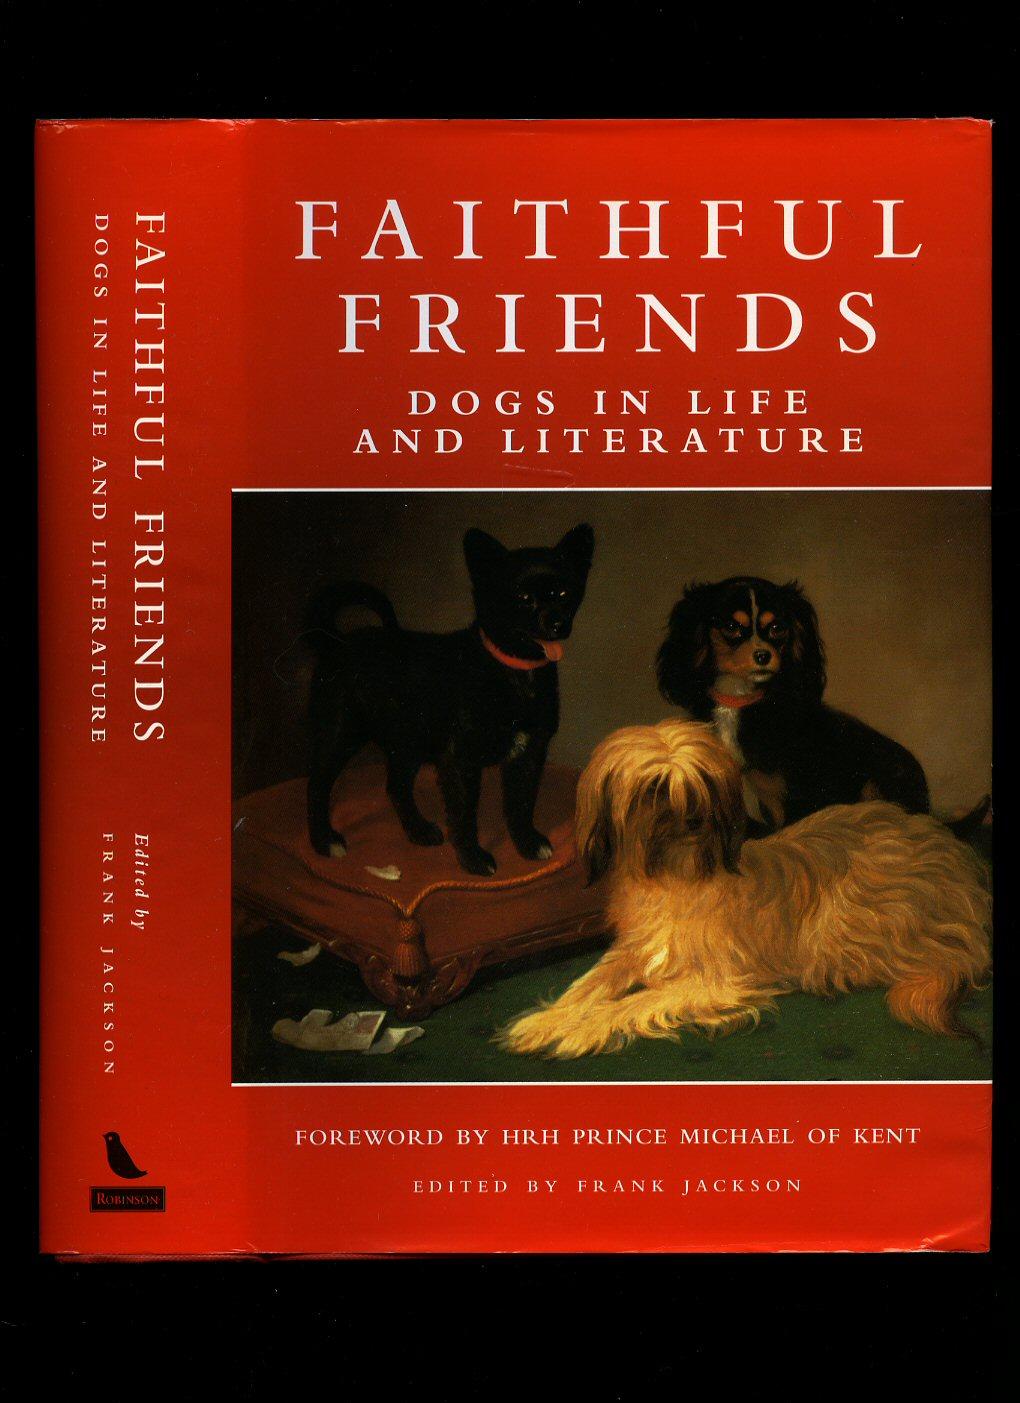 Essay on faithful friend